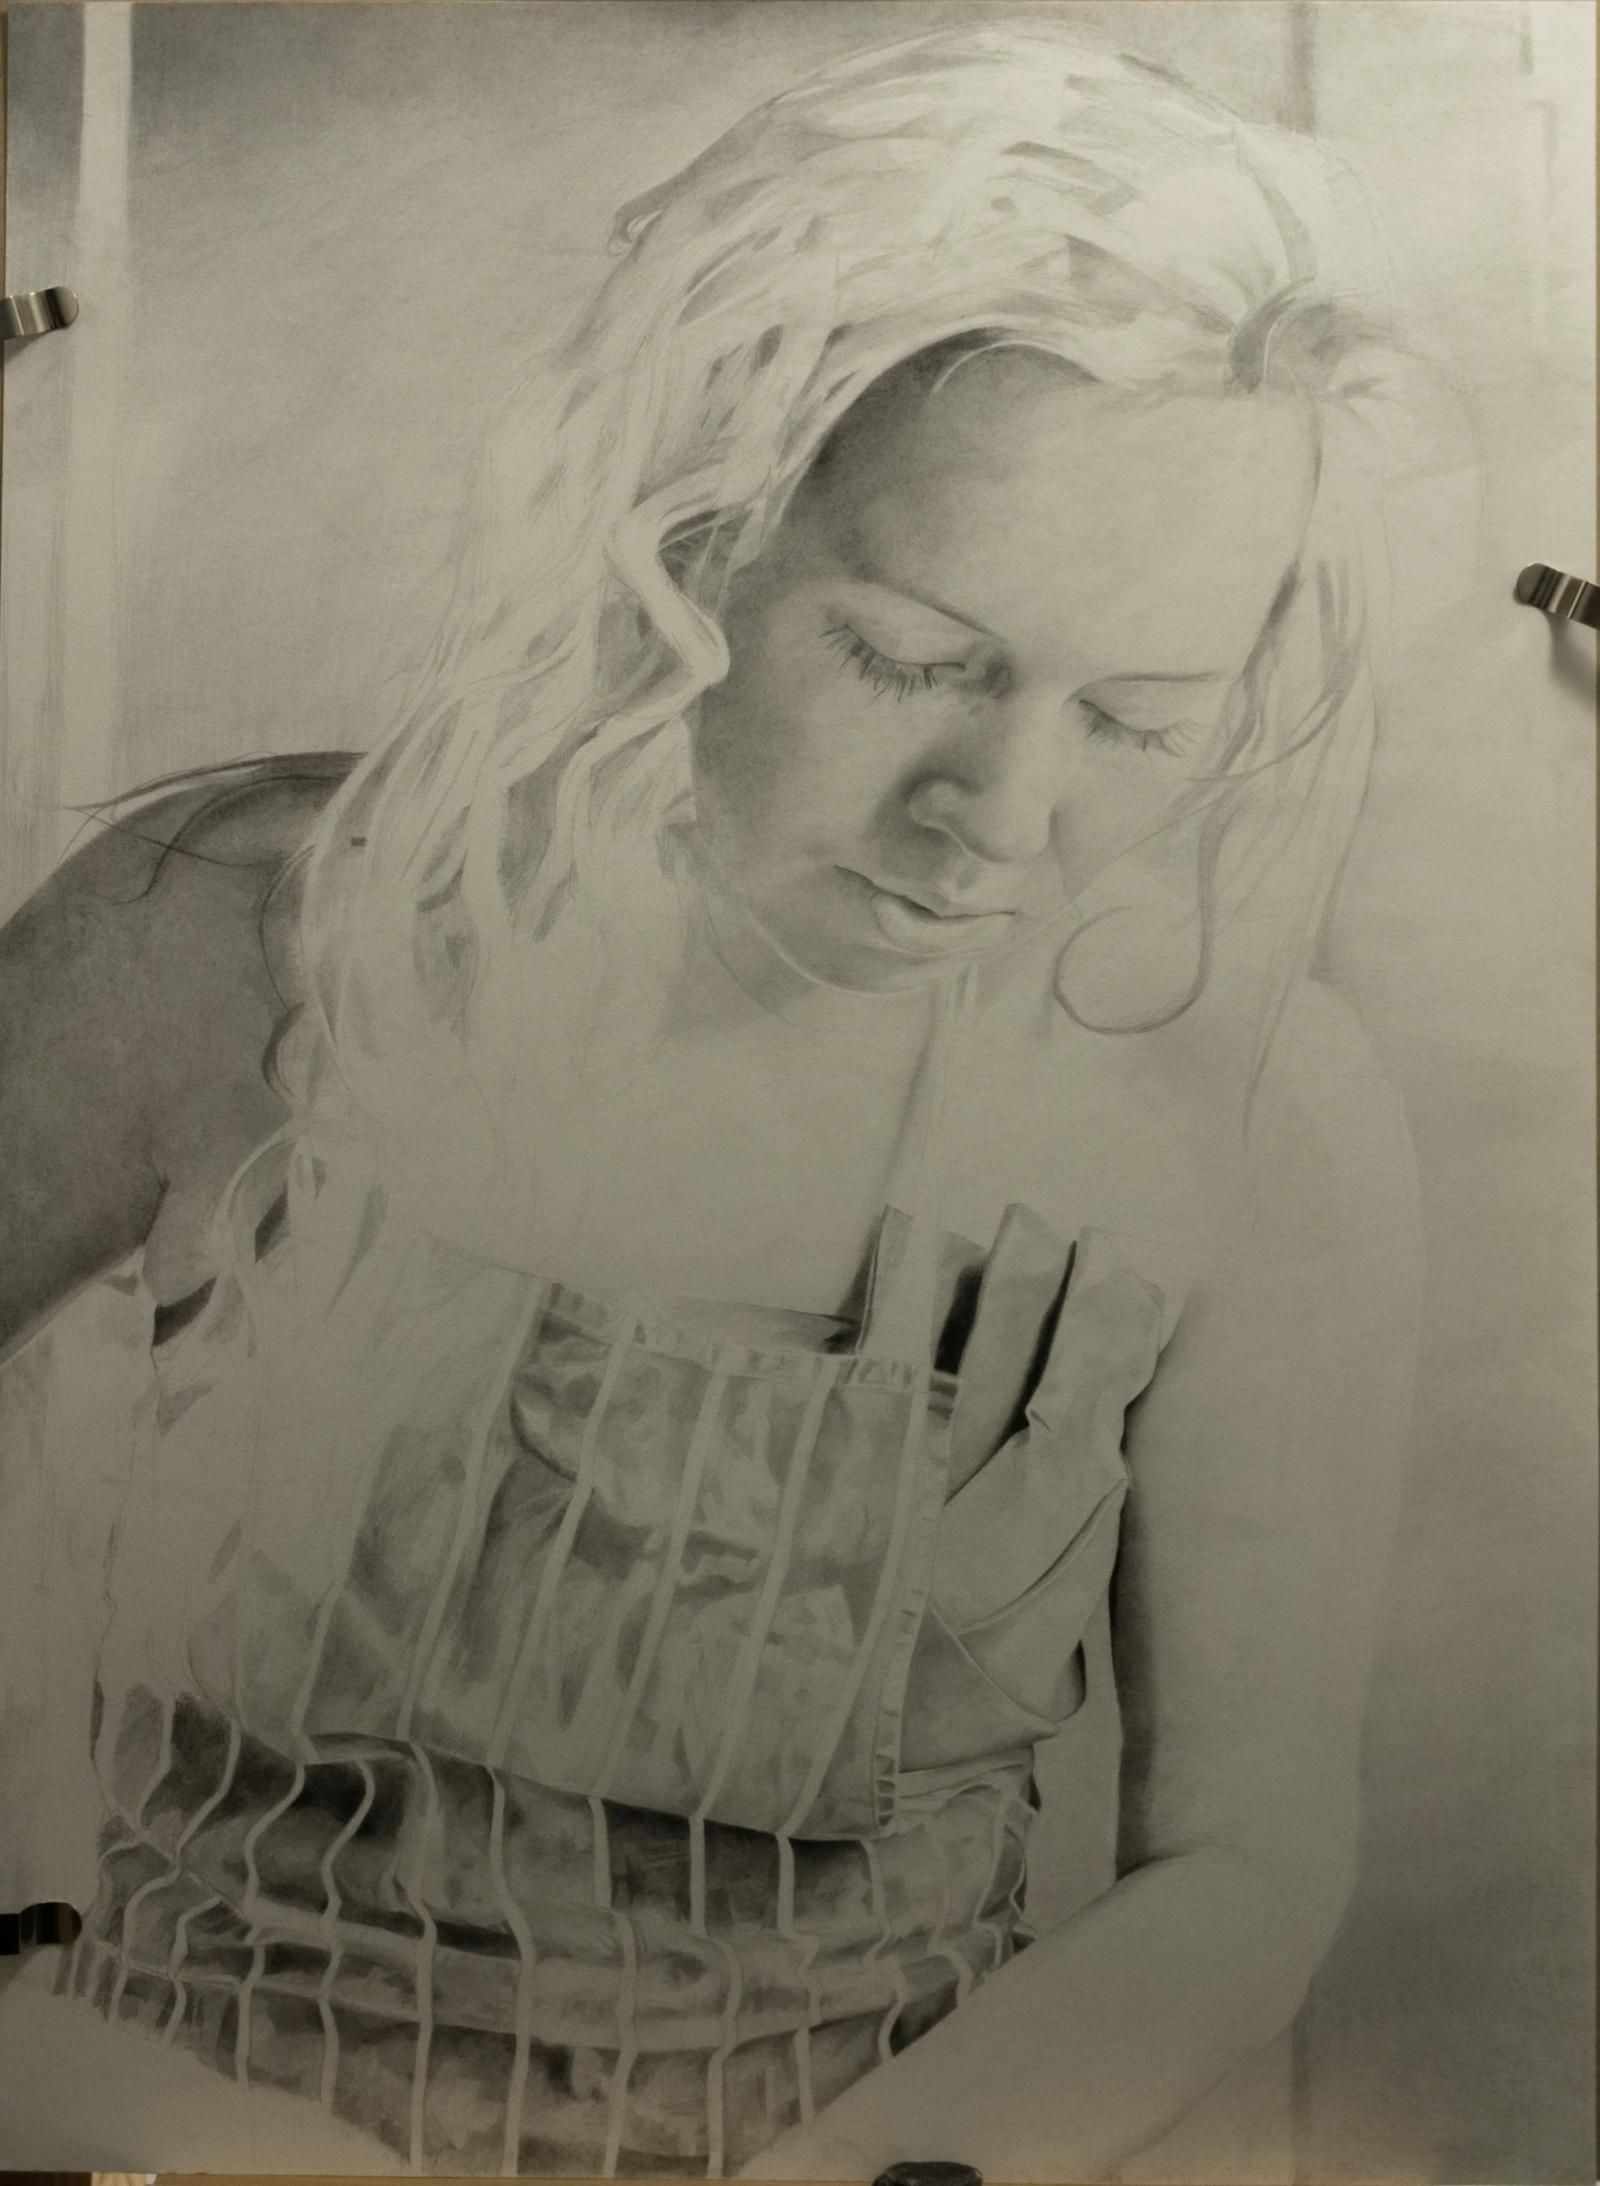 Pencil portrait progress: Jess in Apron - 100 hours